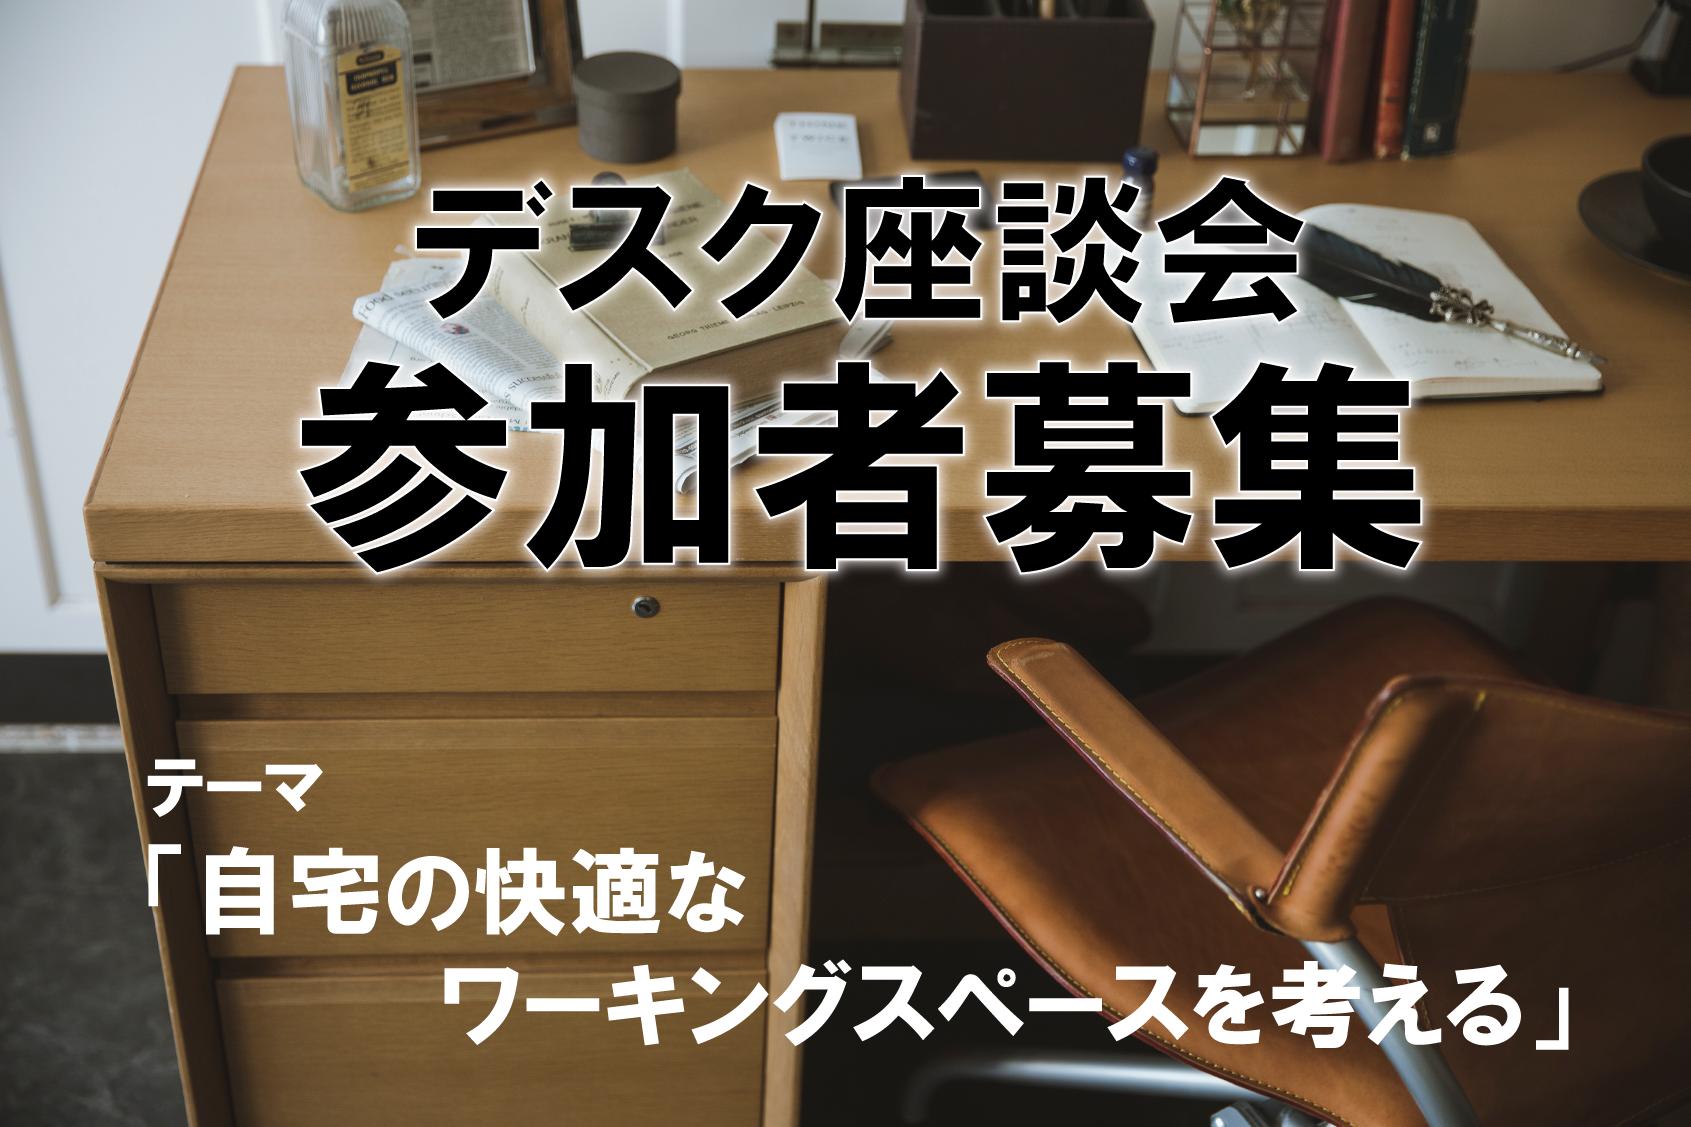 http://www.karimoku.co.jp/blog/gakusyu/%E5%BA%A7%E8%AB%87%E4%BC%9A%E5%8B%9F%E9%9B%86.png